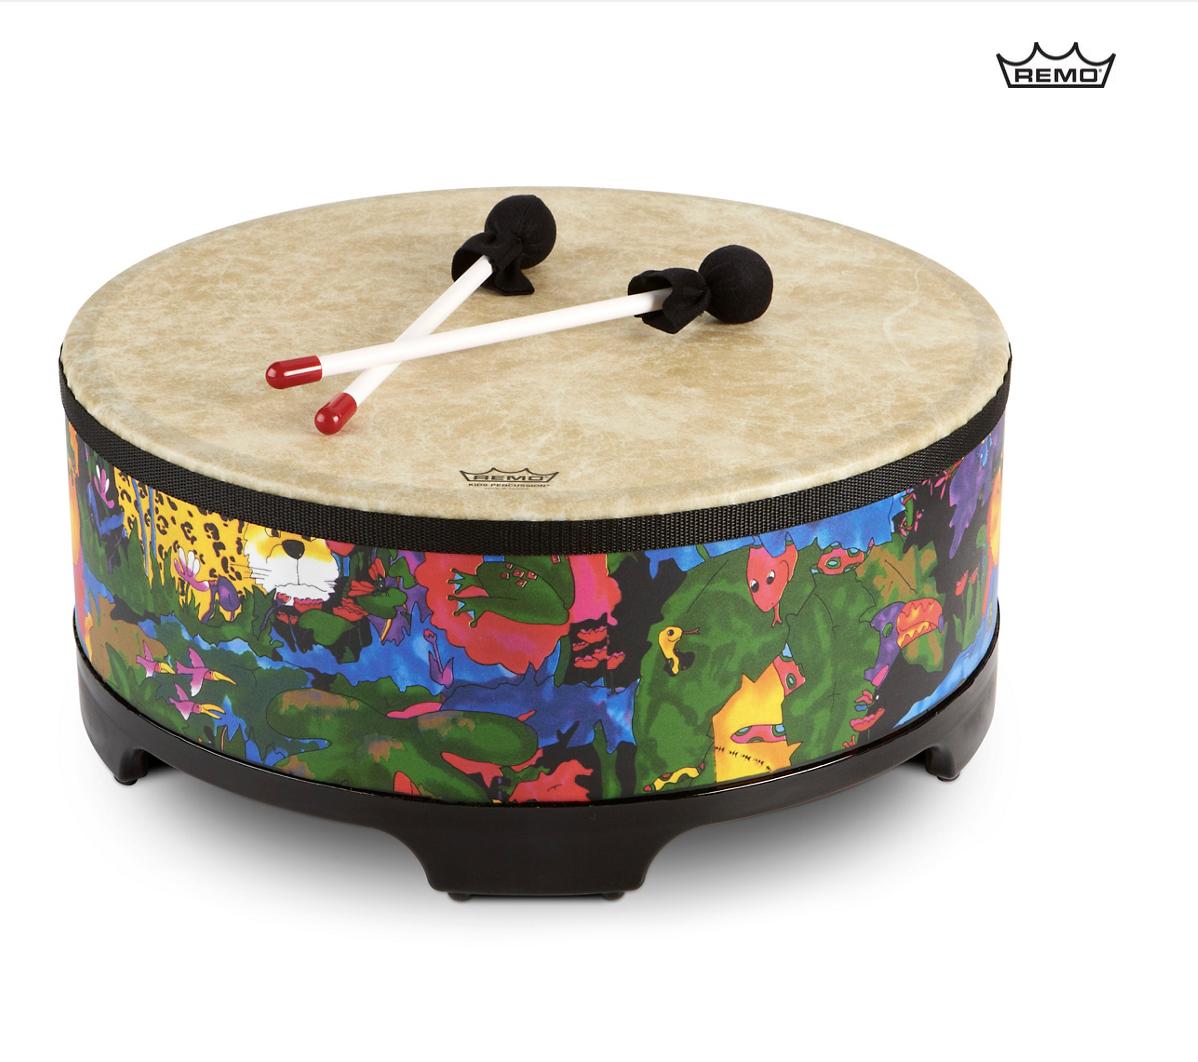 Remo Gathering Drum 16